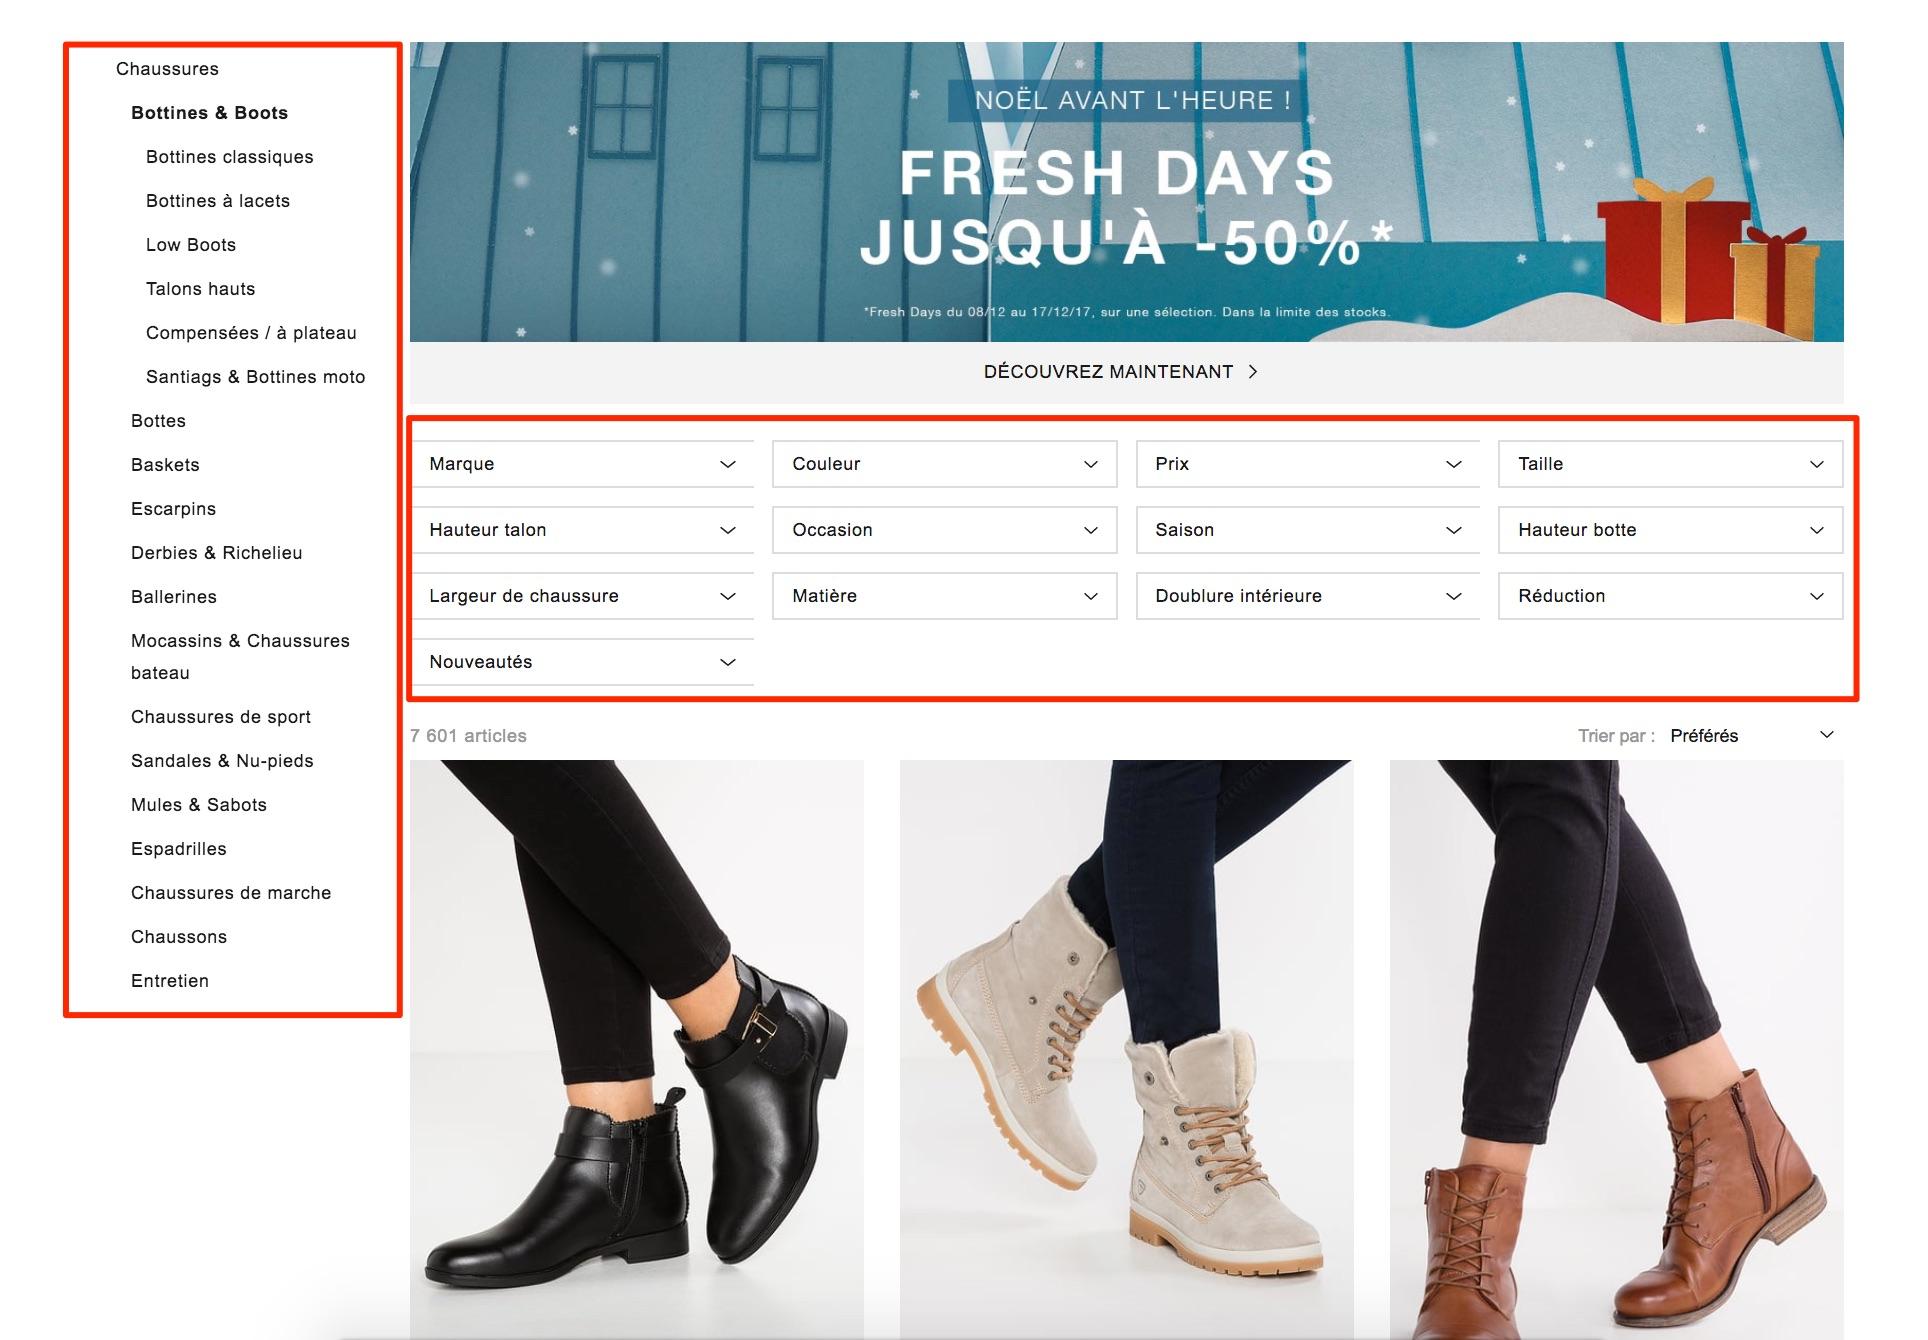 Boots Bottines Femme Zalando e-commerce seo guide smartkeyword